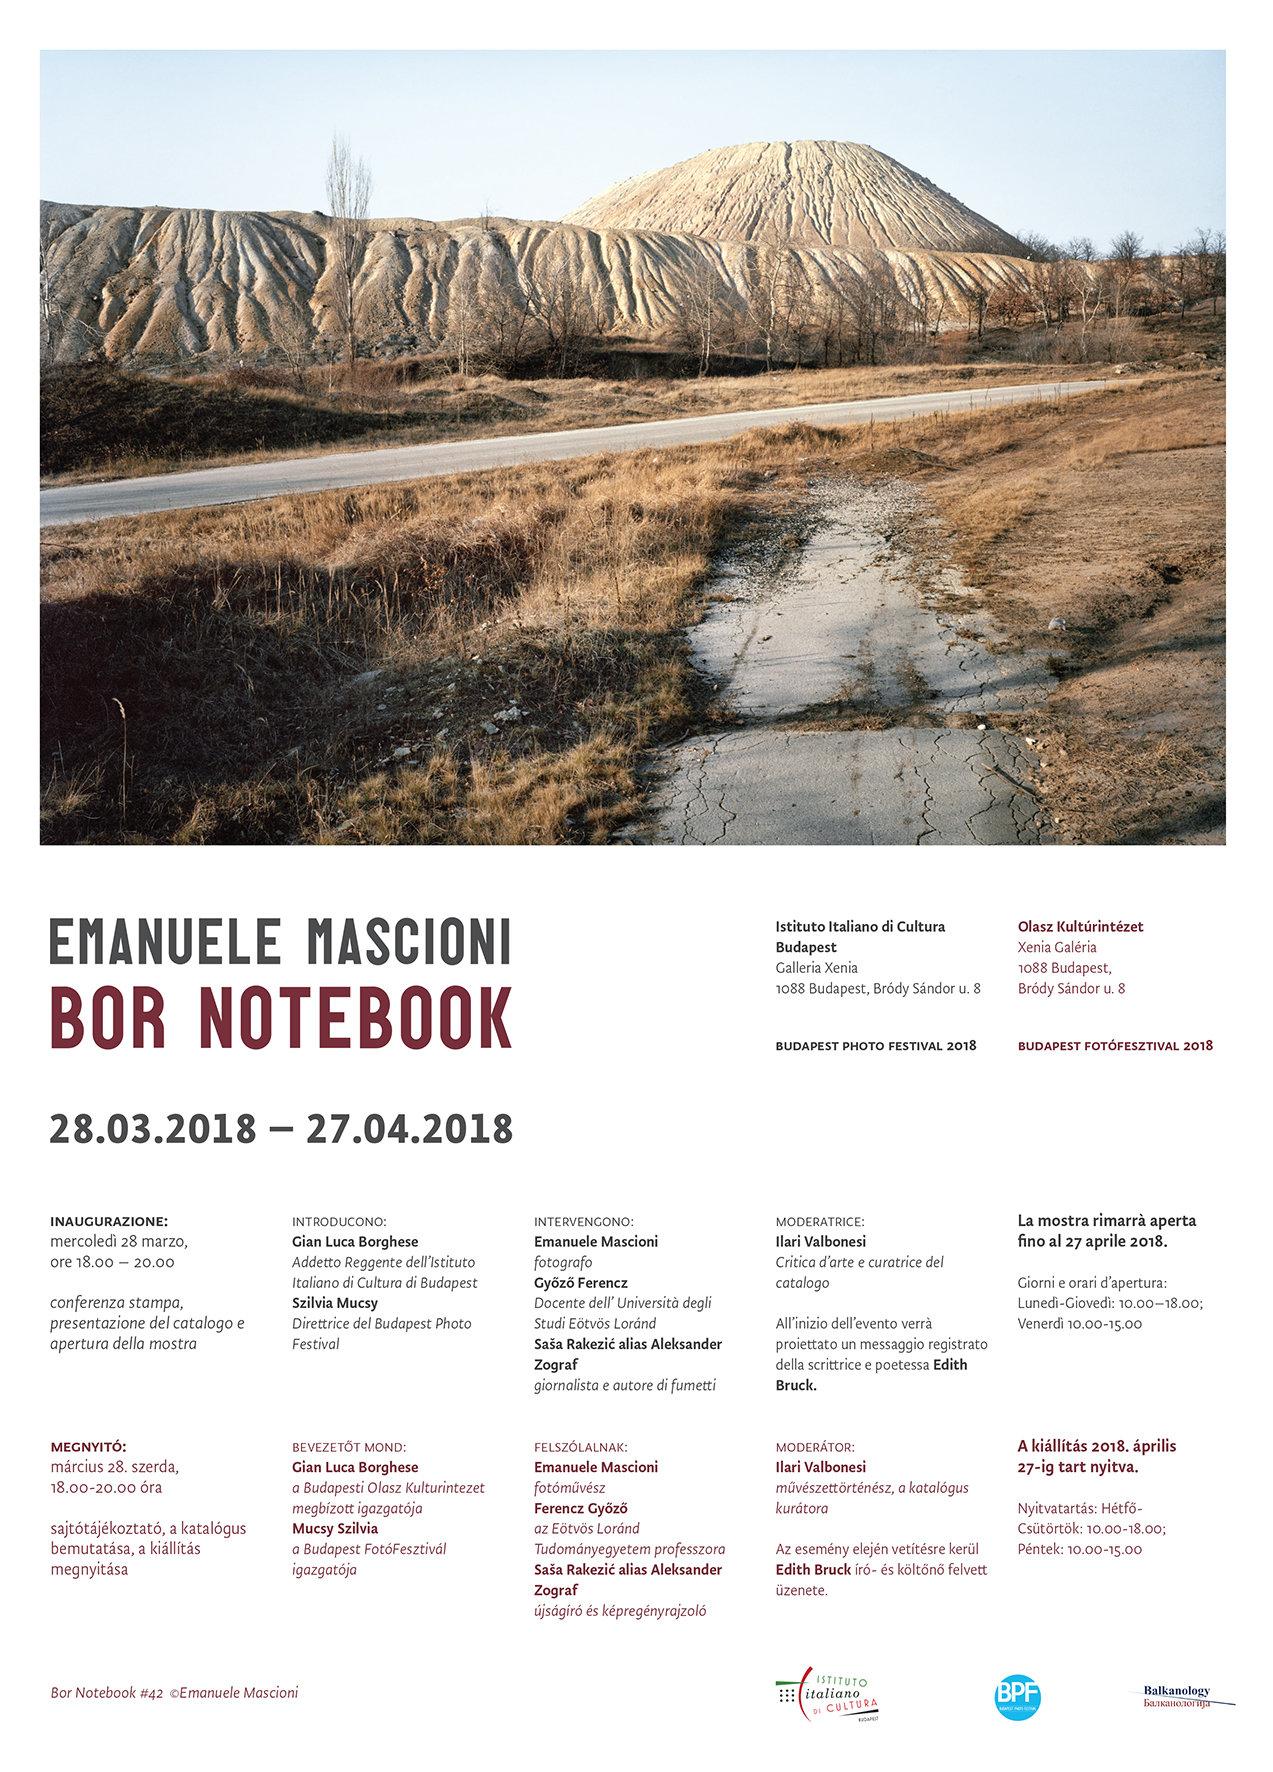 emanuelemascioni-bornotebook-bpf.jpg